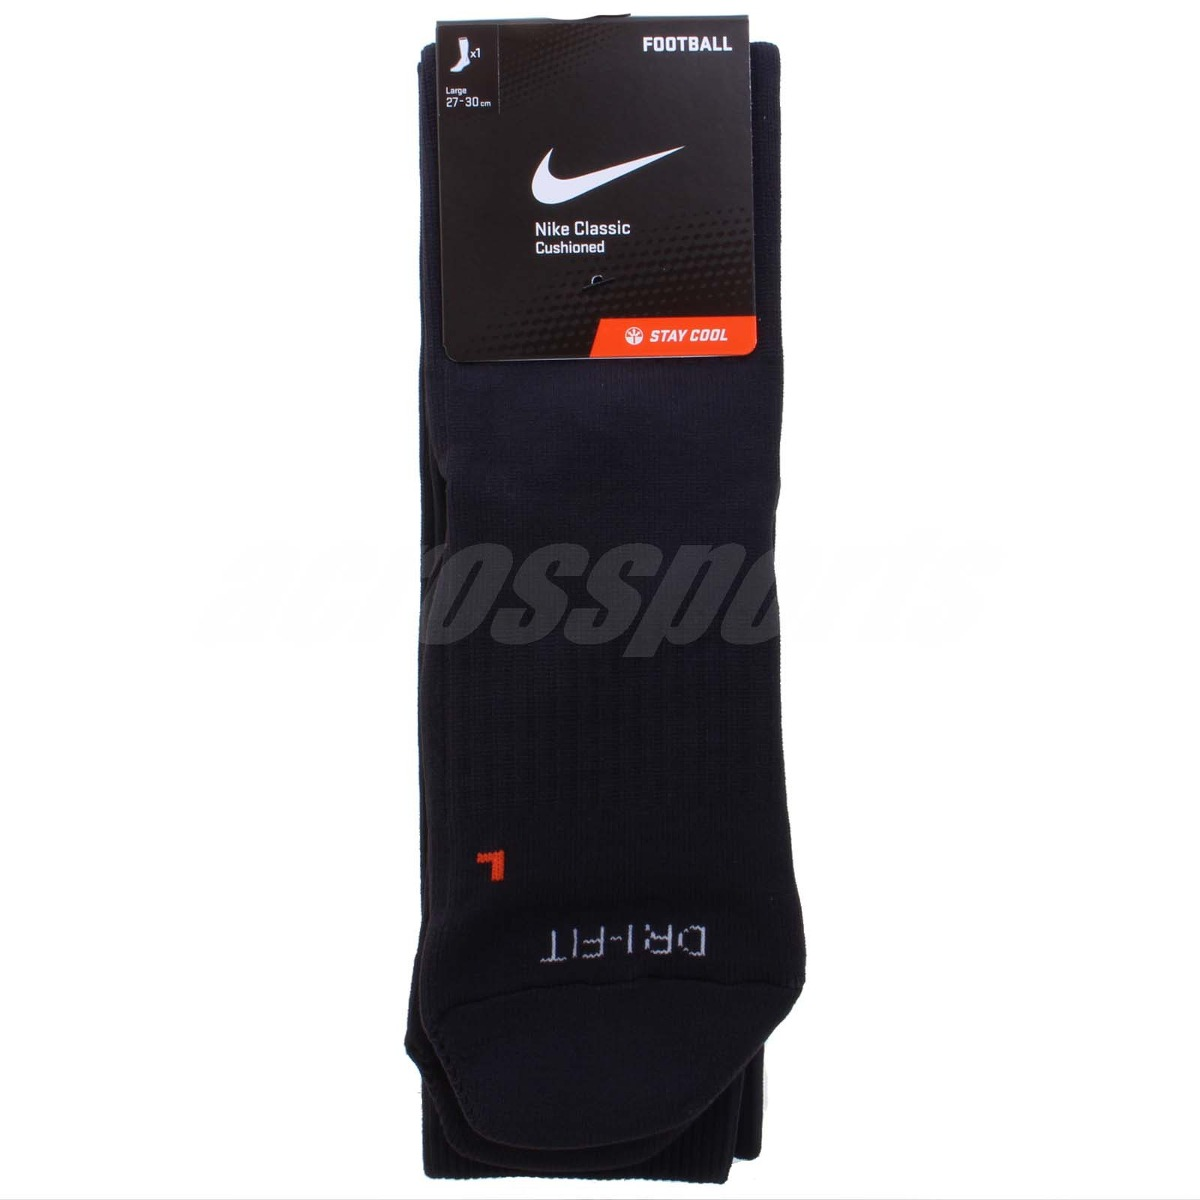 1222ff495c4b6 Medias Nike Classic Fútbol Dri-fit Negras -   45.900 en Mercado Libre